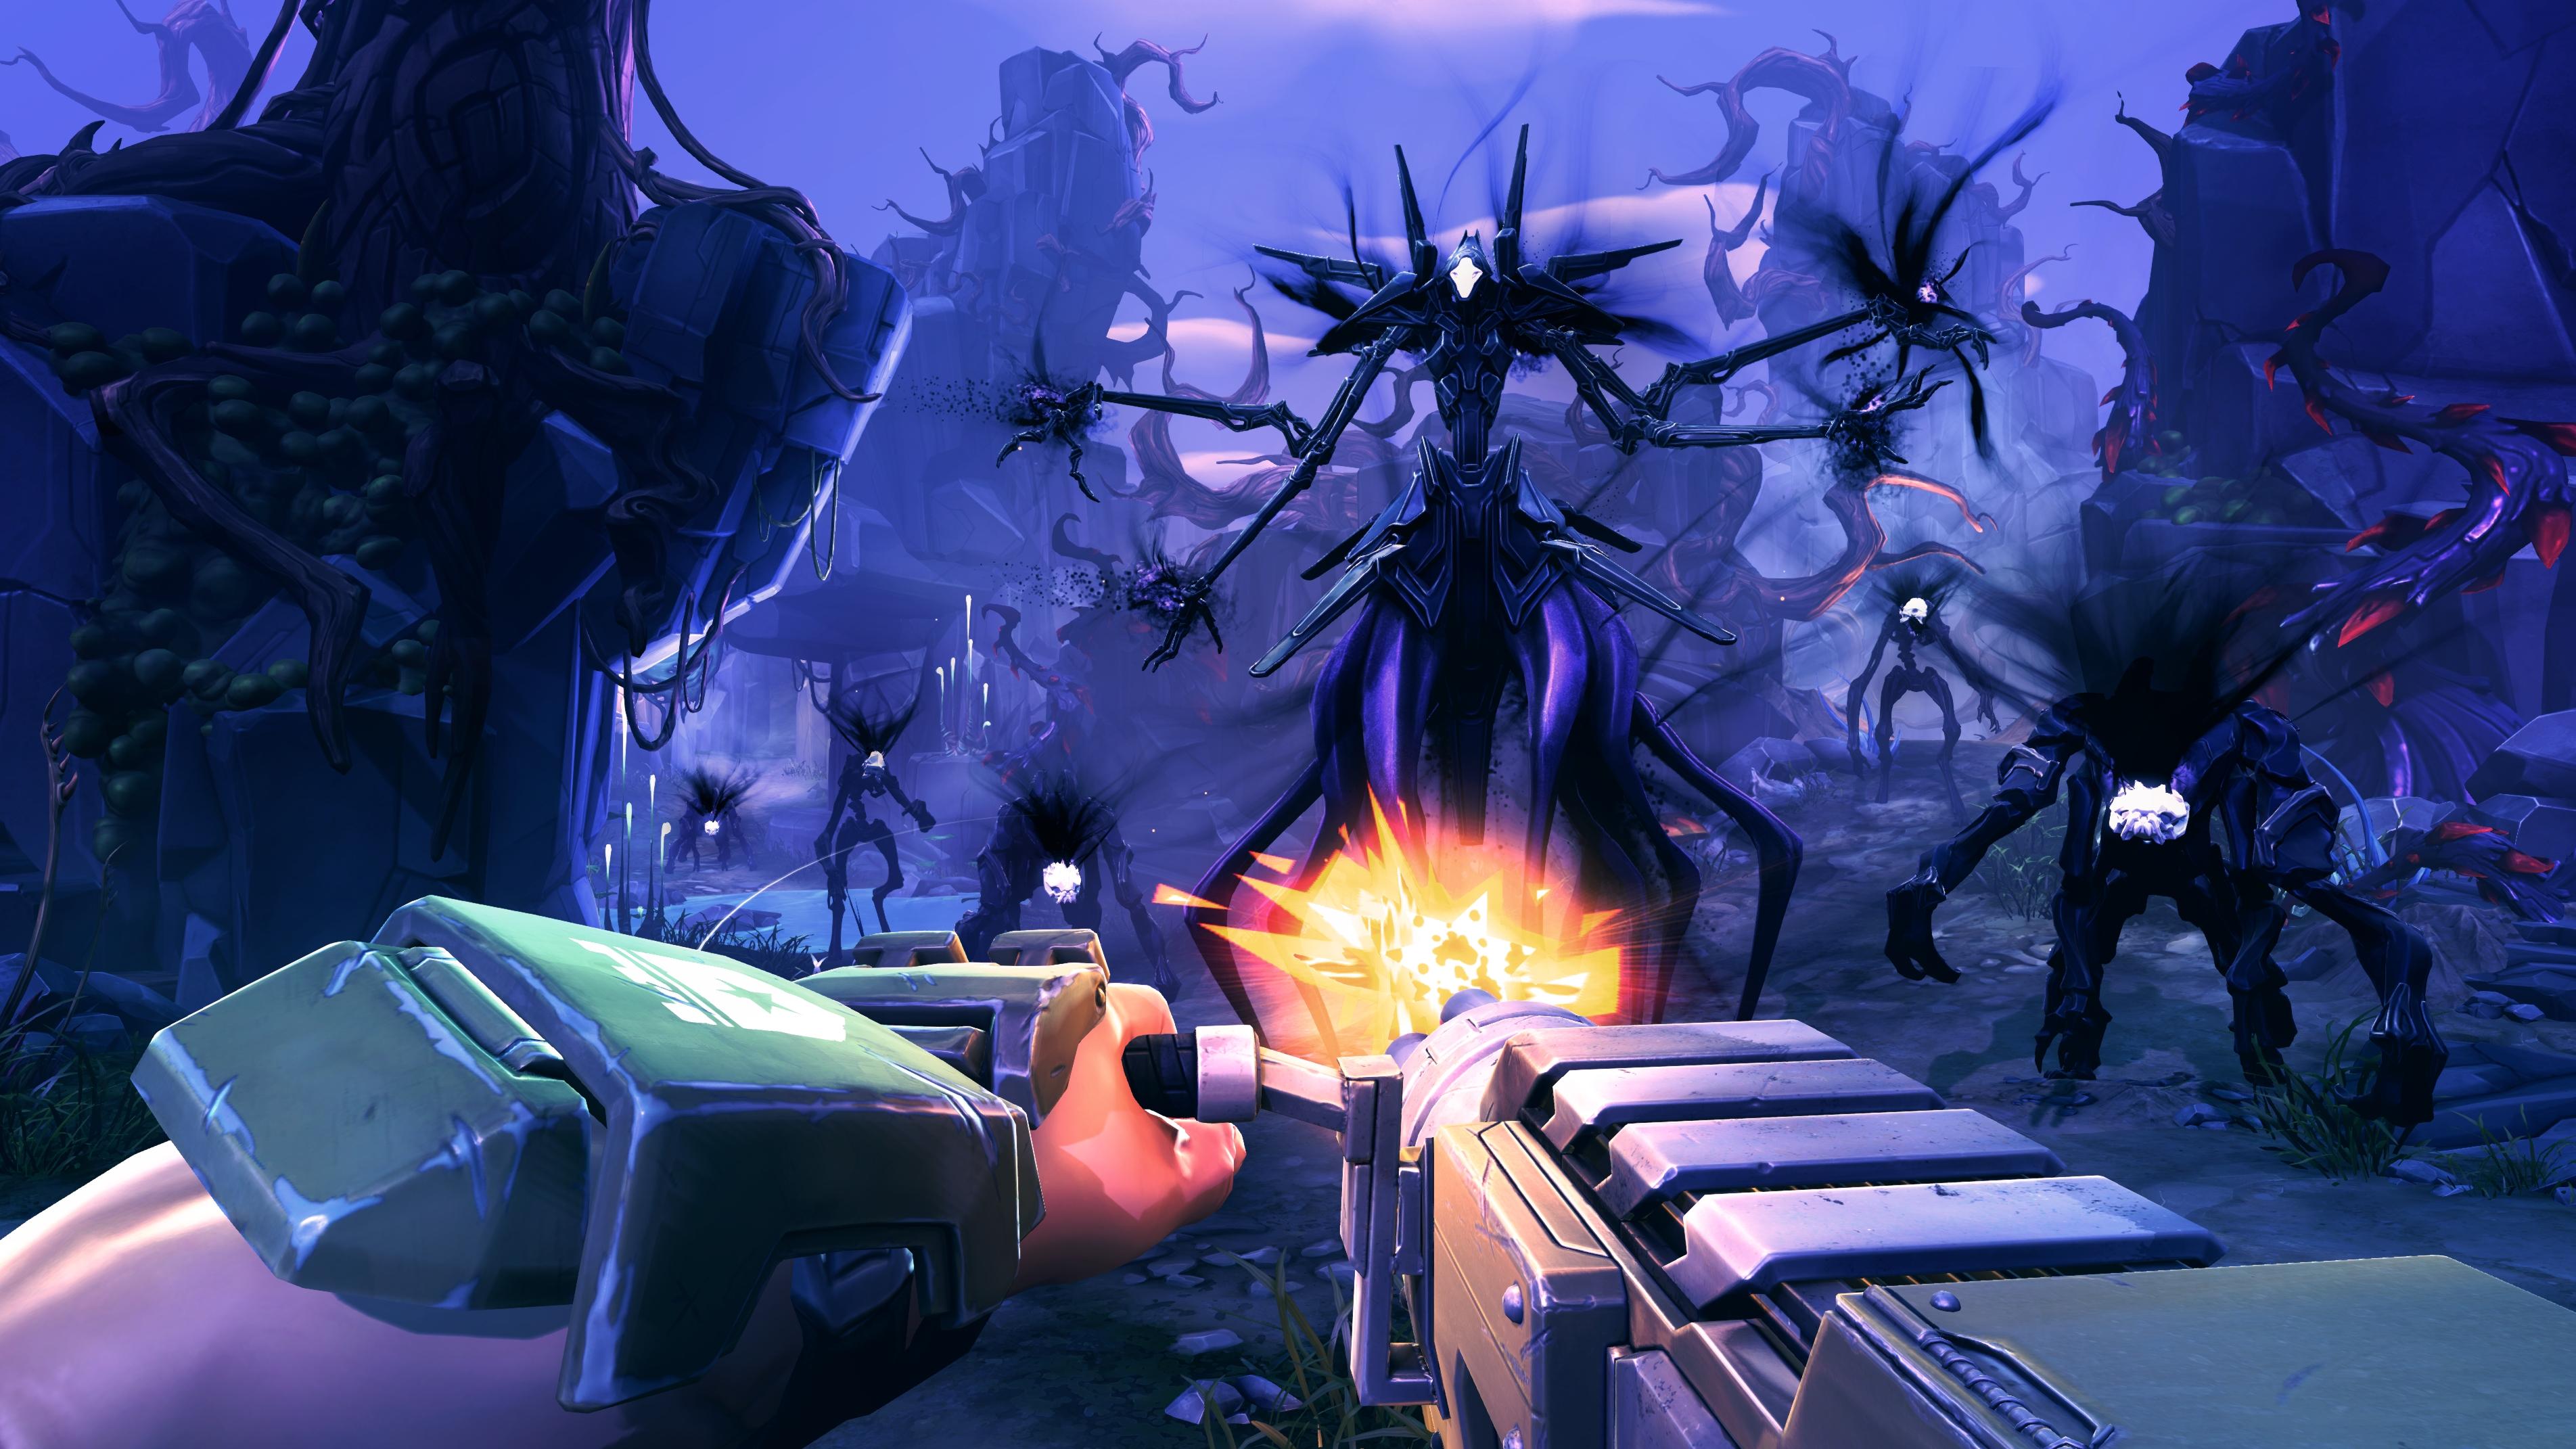 battleborn screenshot - campaign the varelsi arrive